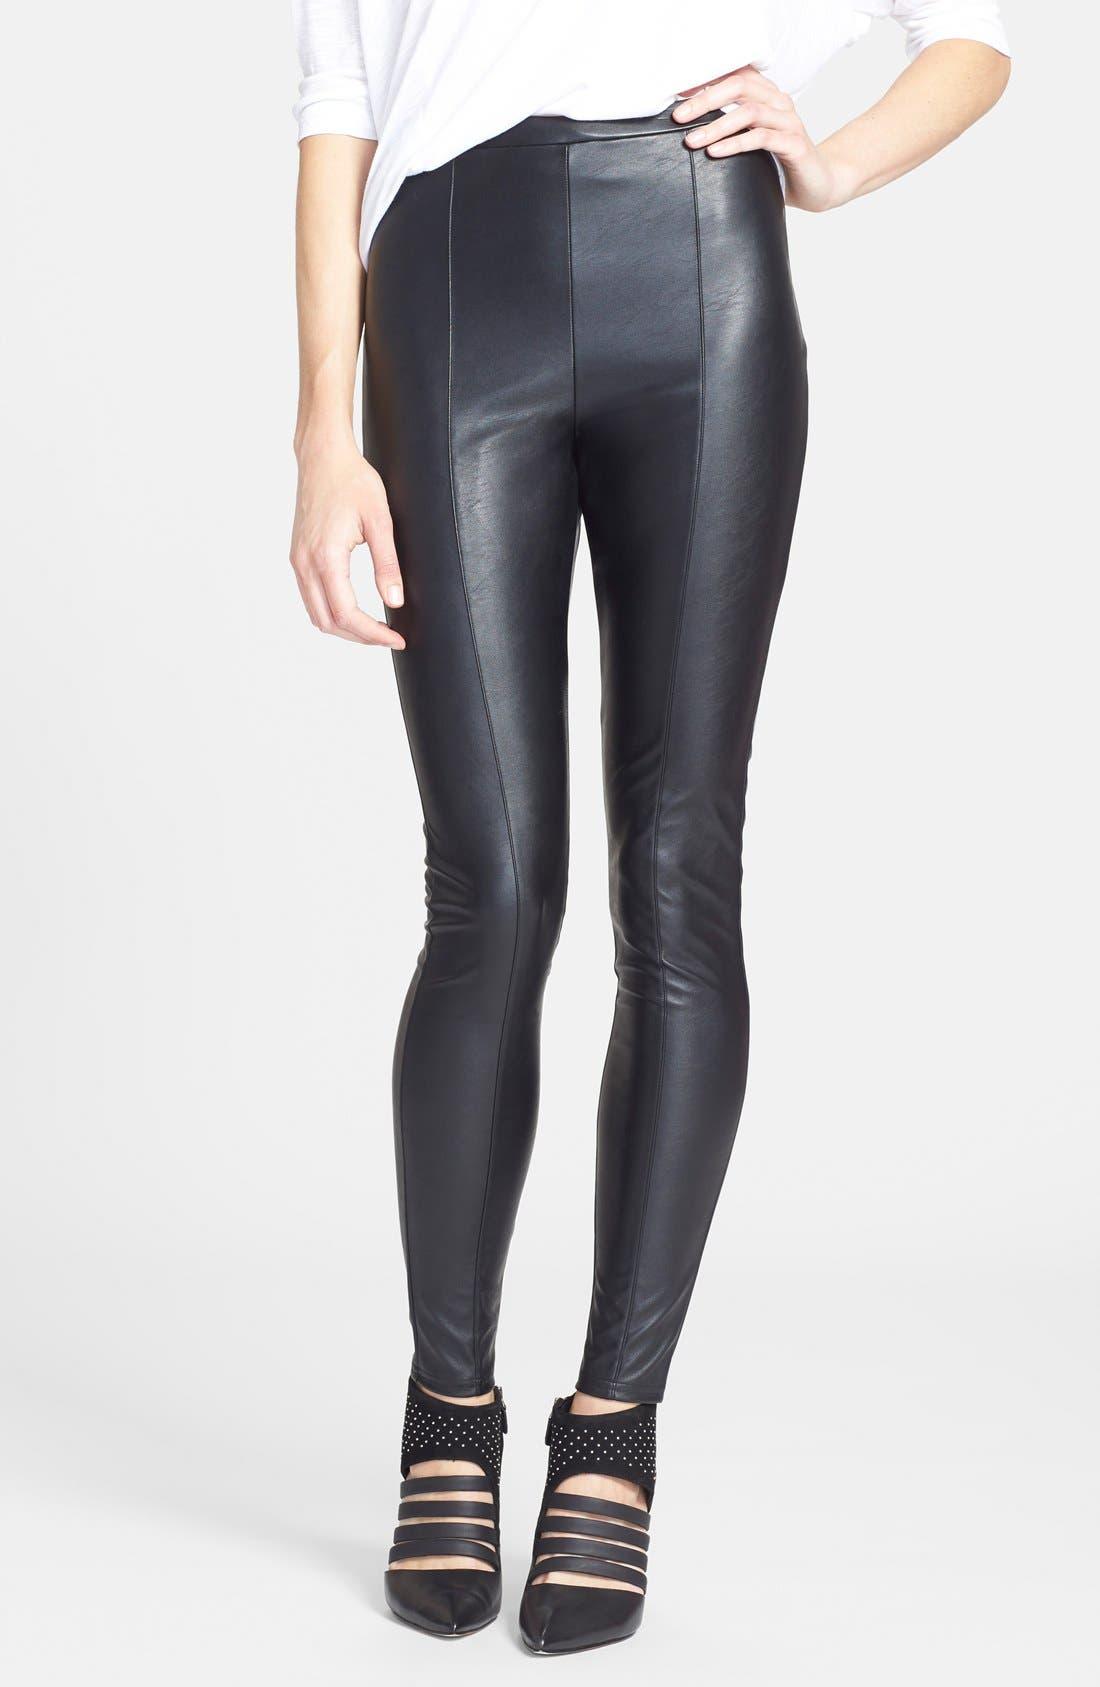 Main Image - Tildon High Waist Faux Leather Leggings